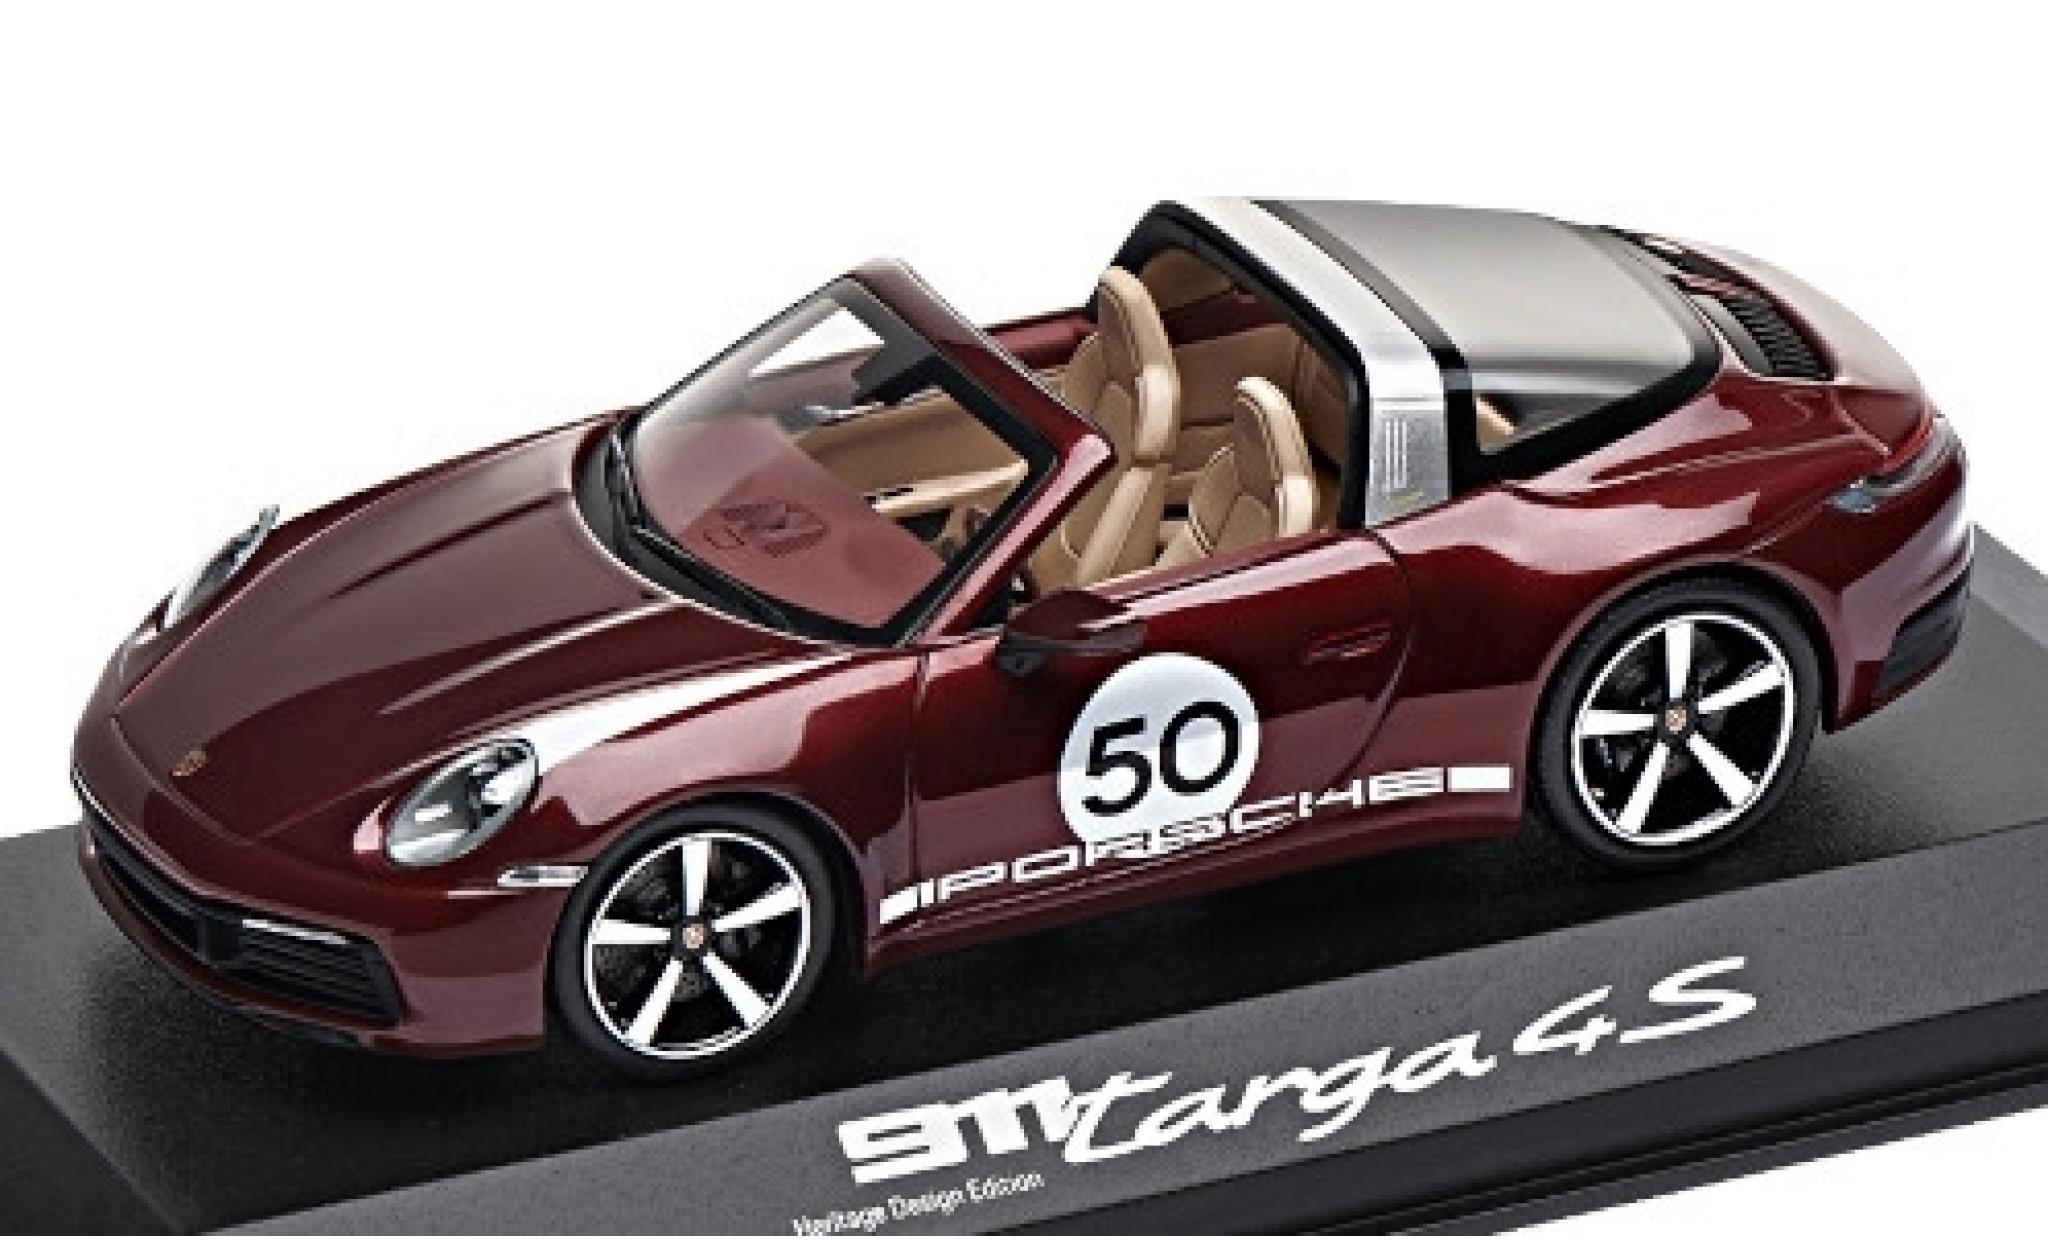 Porsche 911 1/43 I Minichamps Targa 4S metallise rot/Dekor No.50 Heritage Design Edition